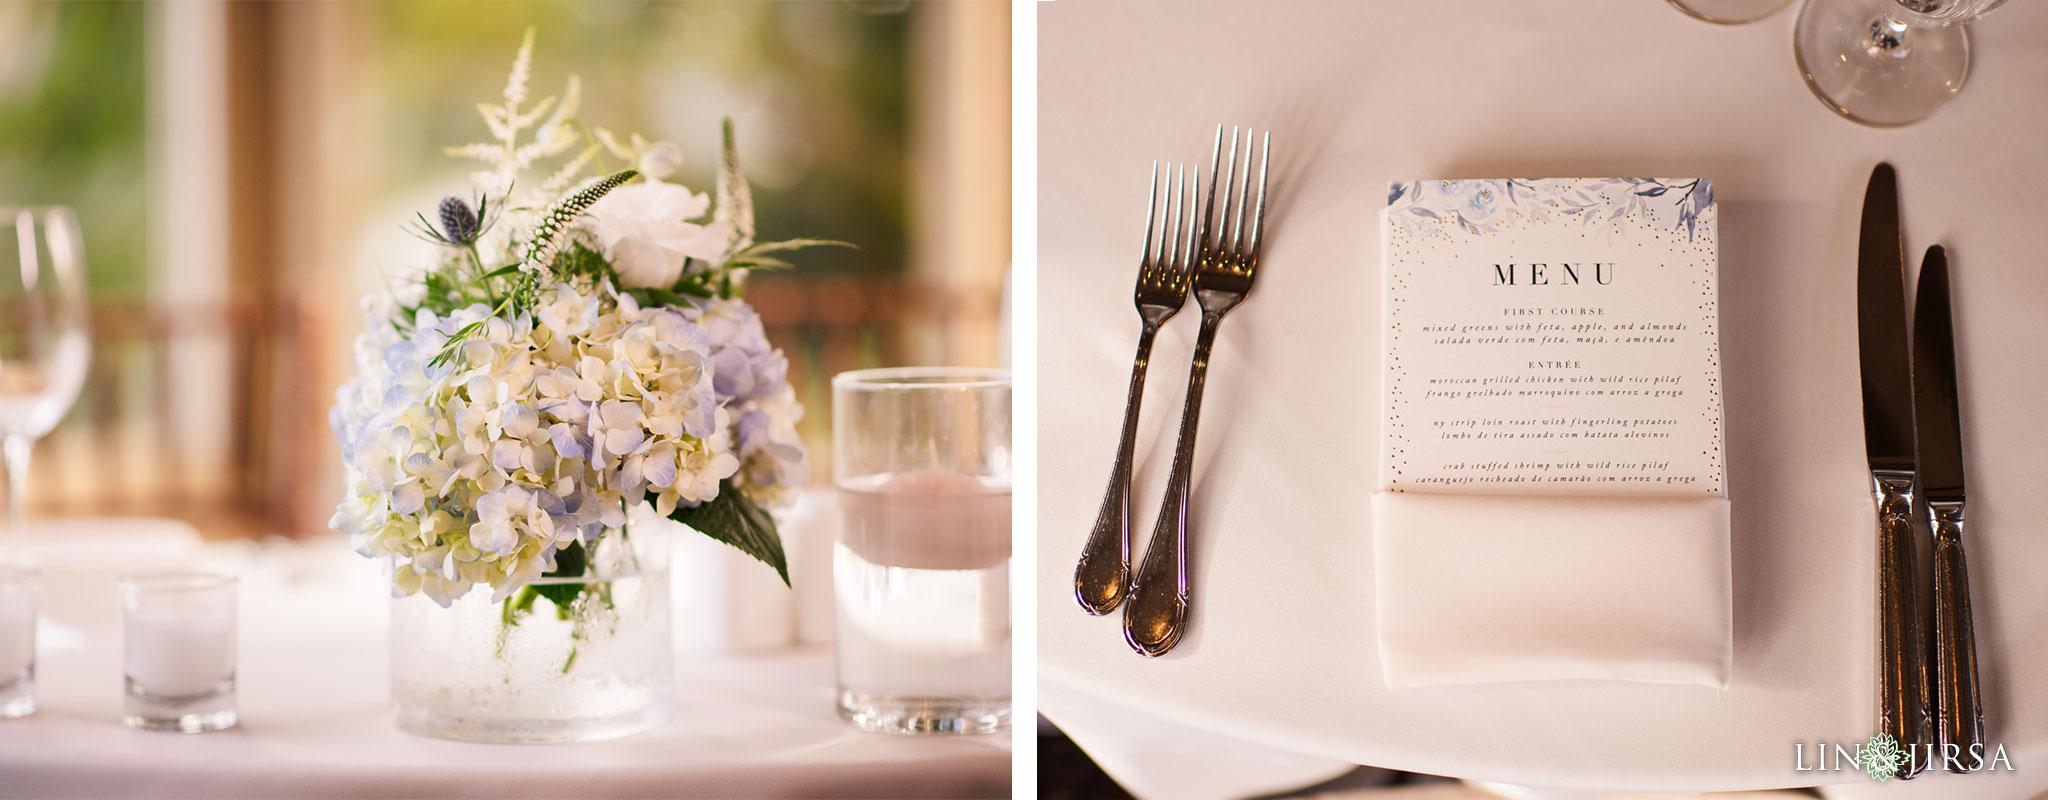 35 la venta inn palos verdes wedding photography